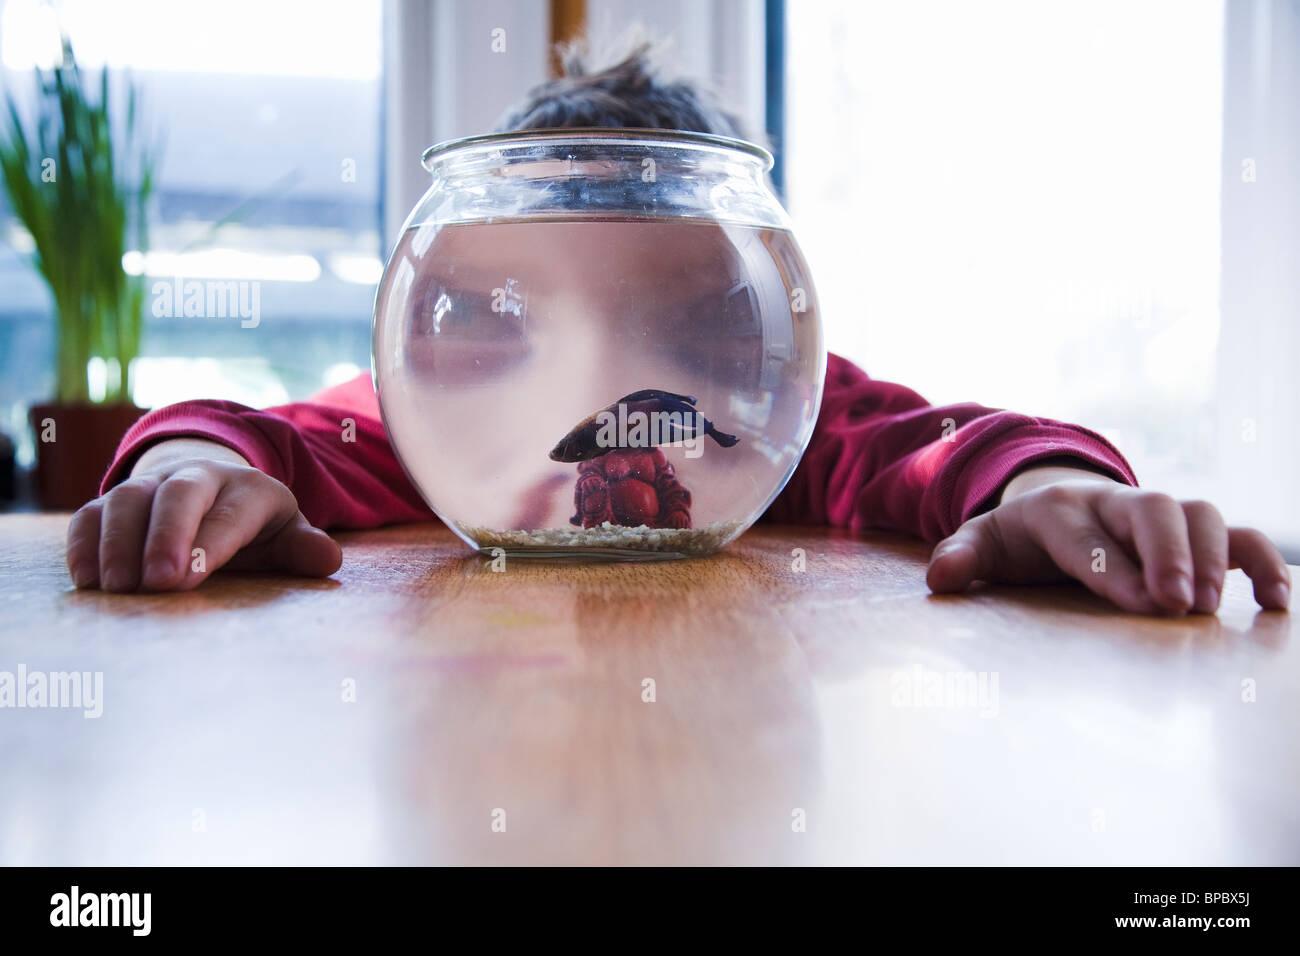 Boy Watching His Pet Betta Fish In A Tank Fishbowl